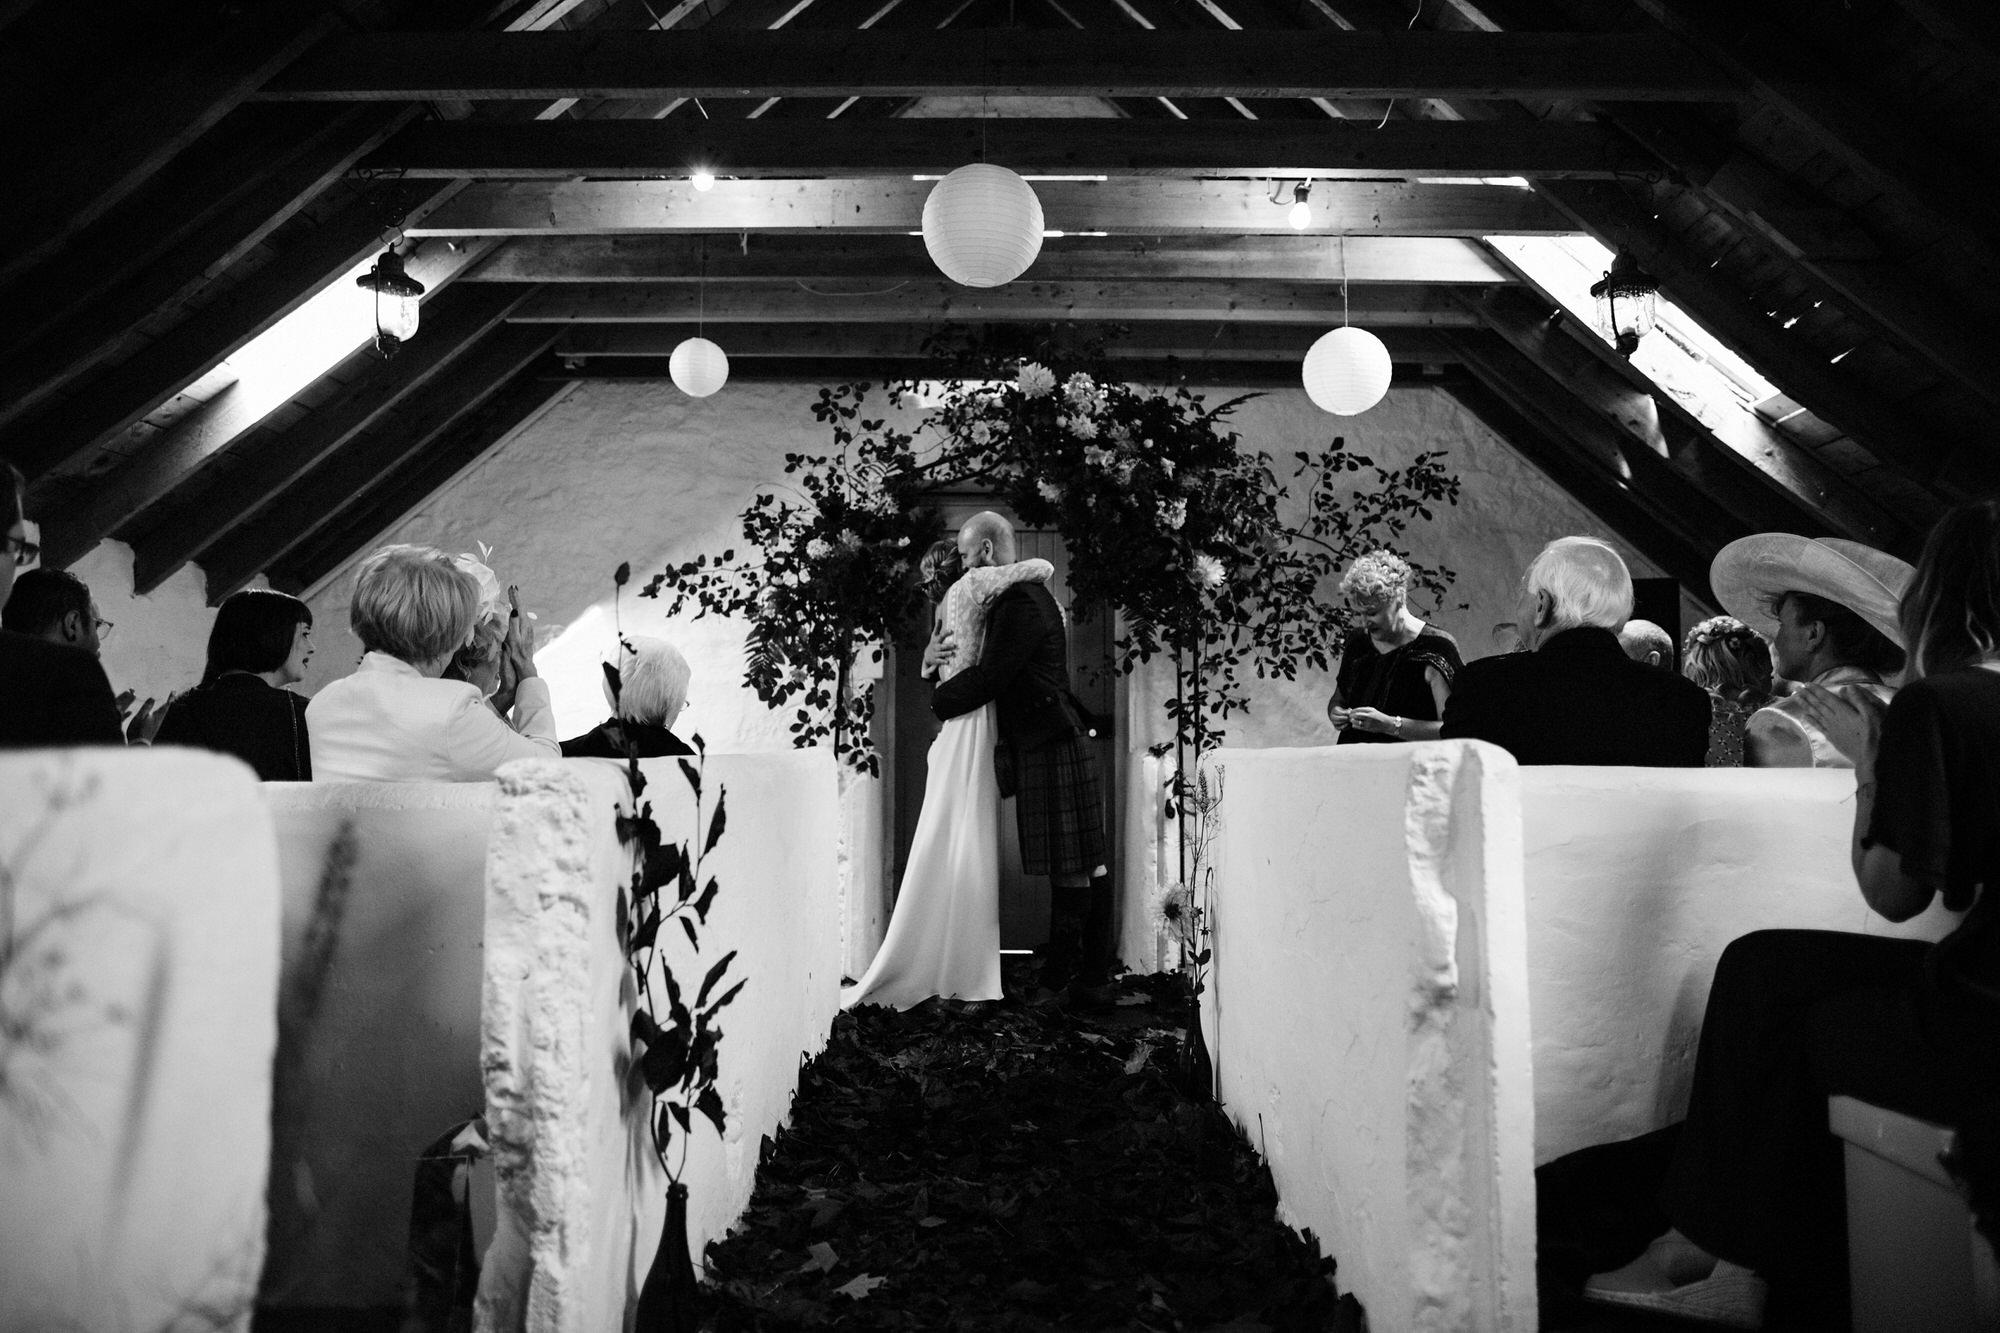 020 TIN SHED KNOCKRAICH WEDDING AUTUMN ZOE ALEXANDRA PHOTOGRAPHY